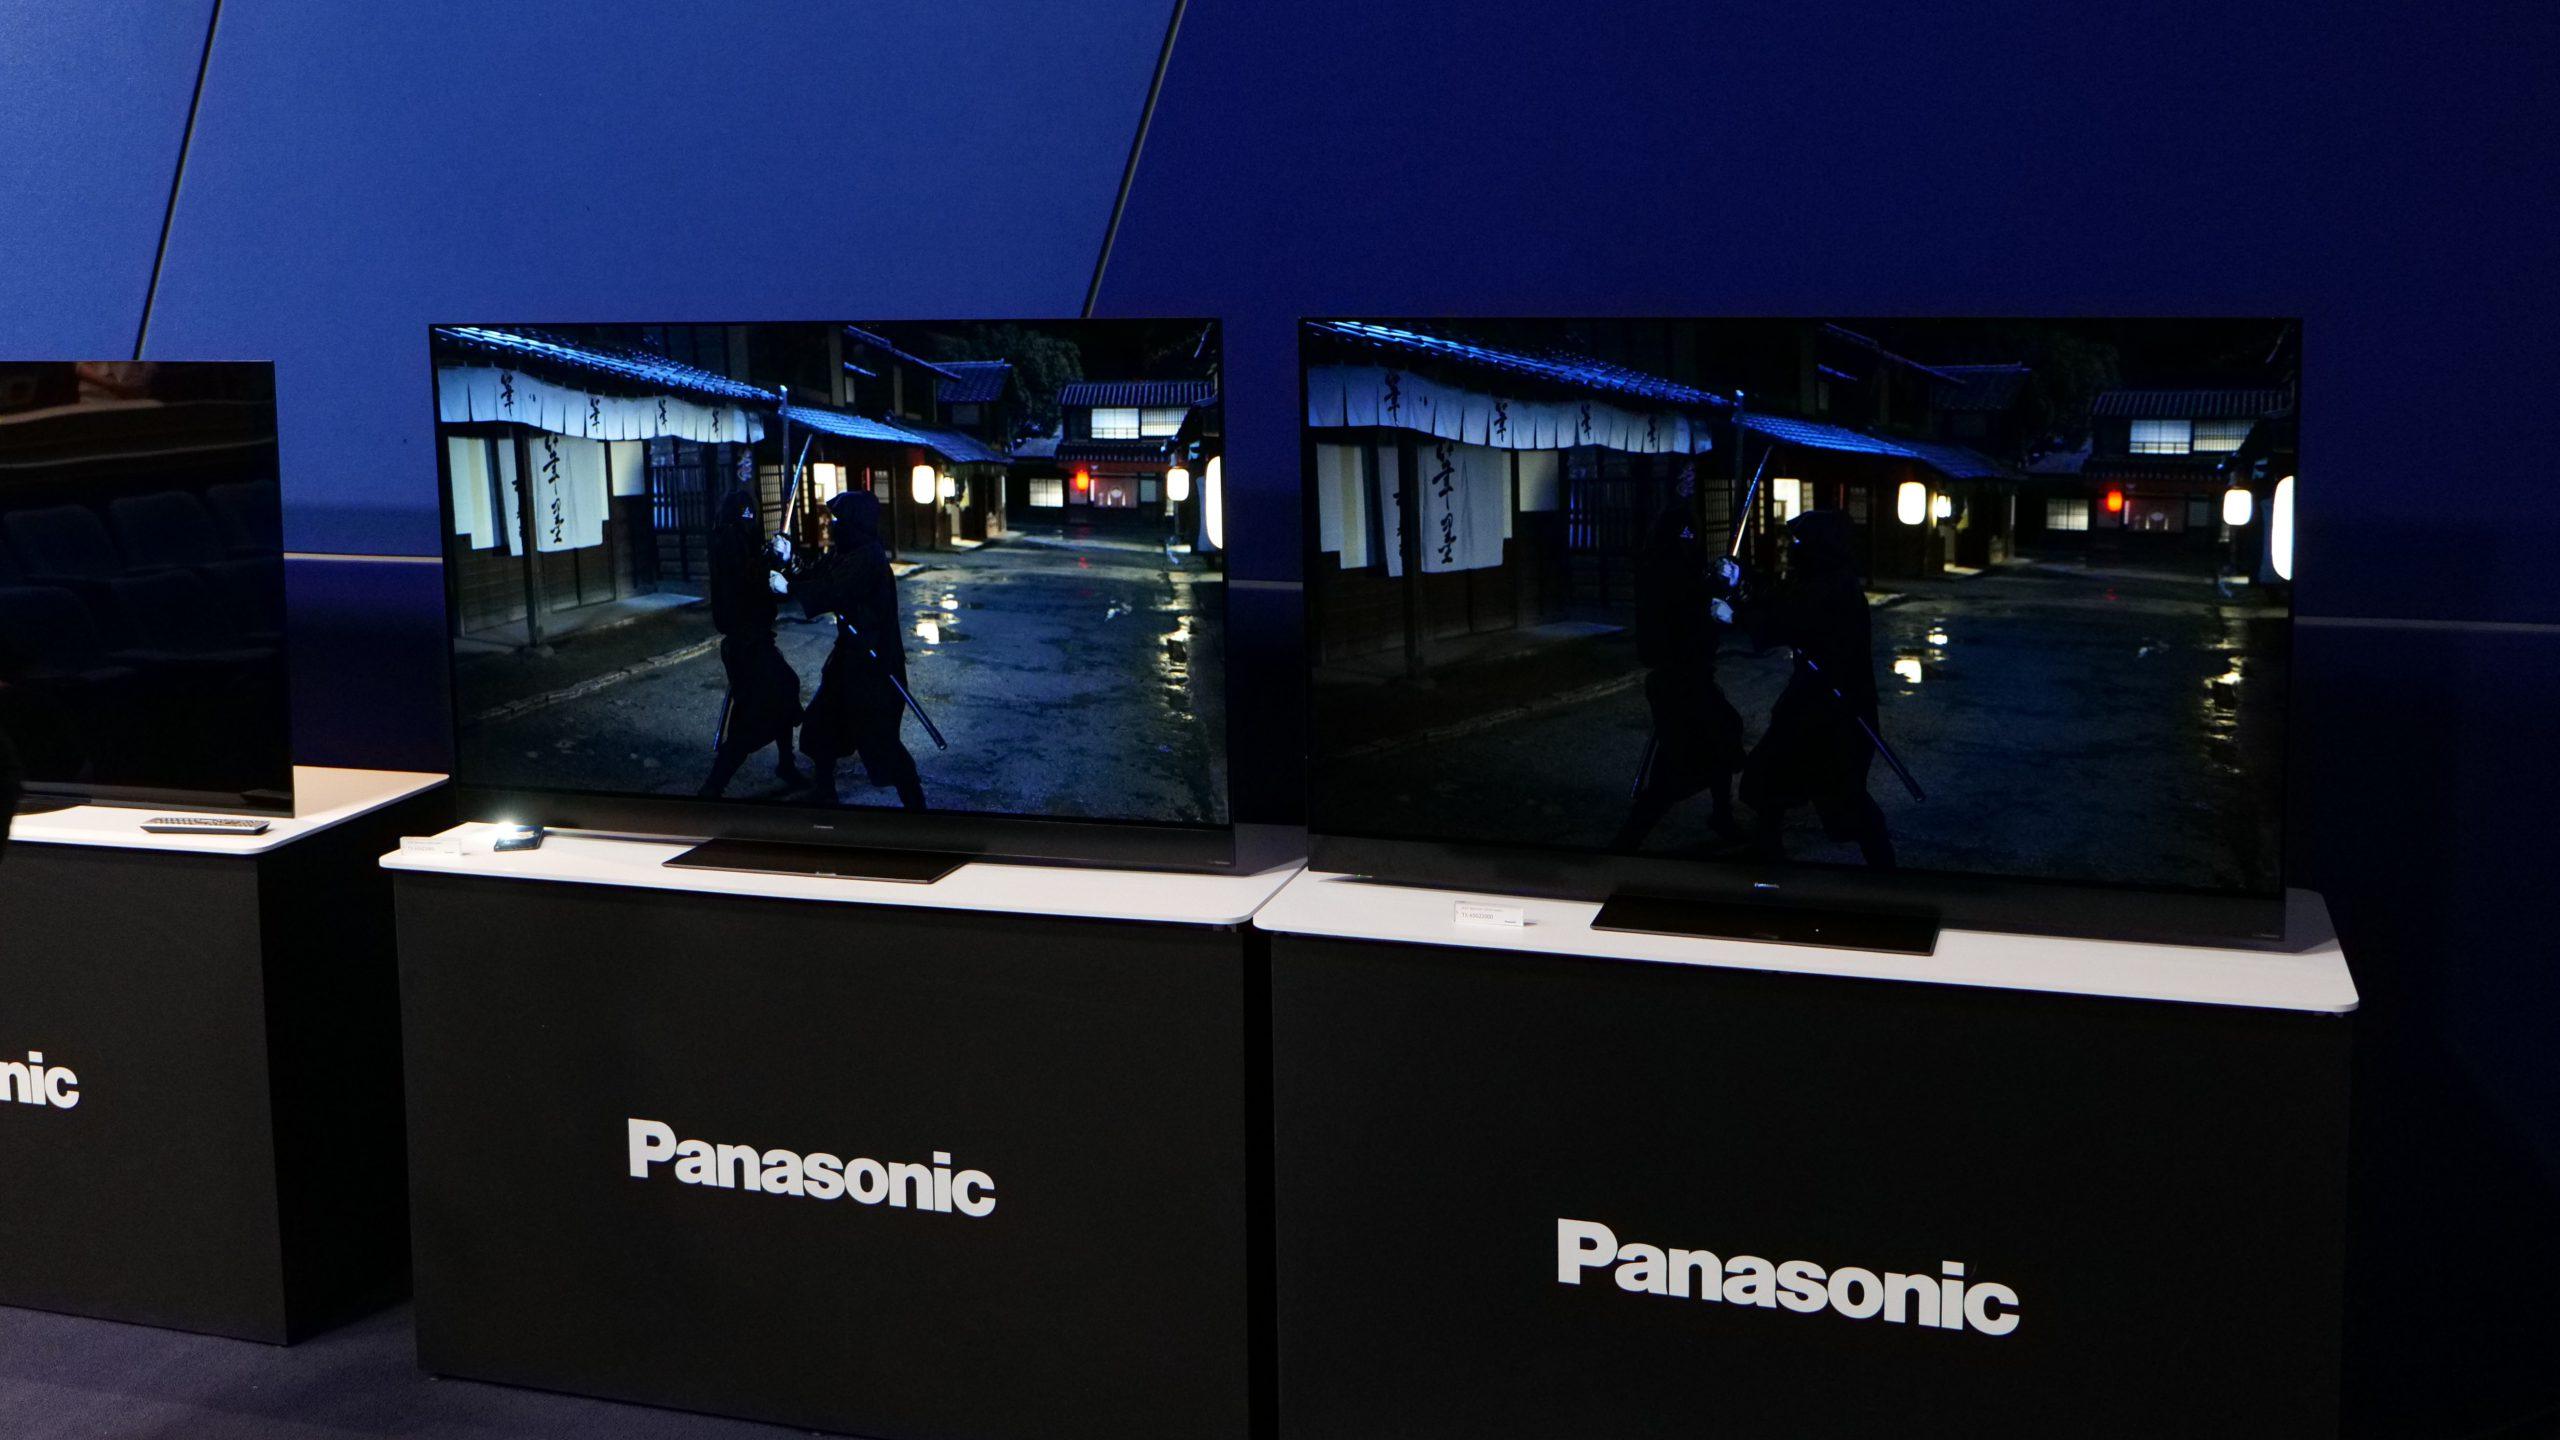 Panasonic FilmMaker Mode intelligent